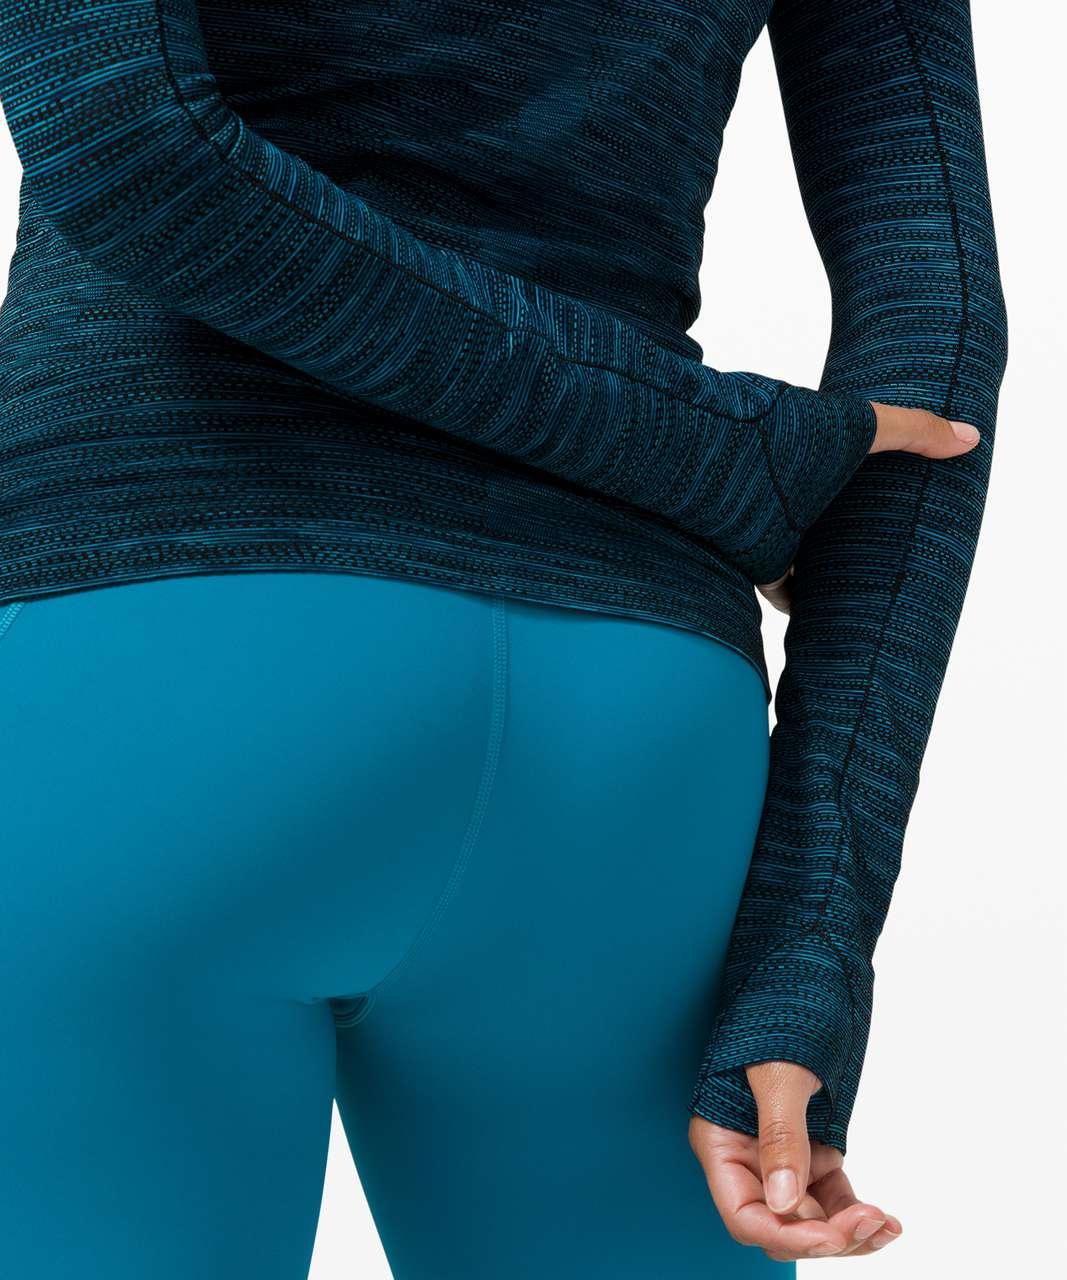 Lululemon Swiftly Tech Long Sleeve 2.0 - Prism Stripe Turquoise Tide Multi